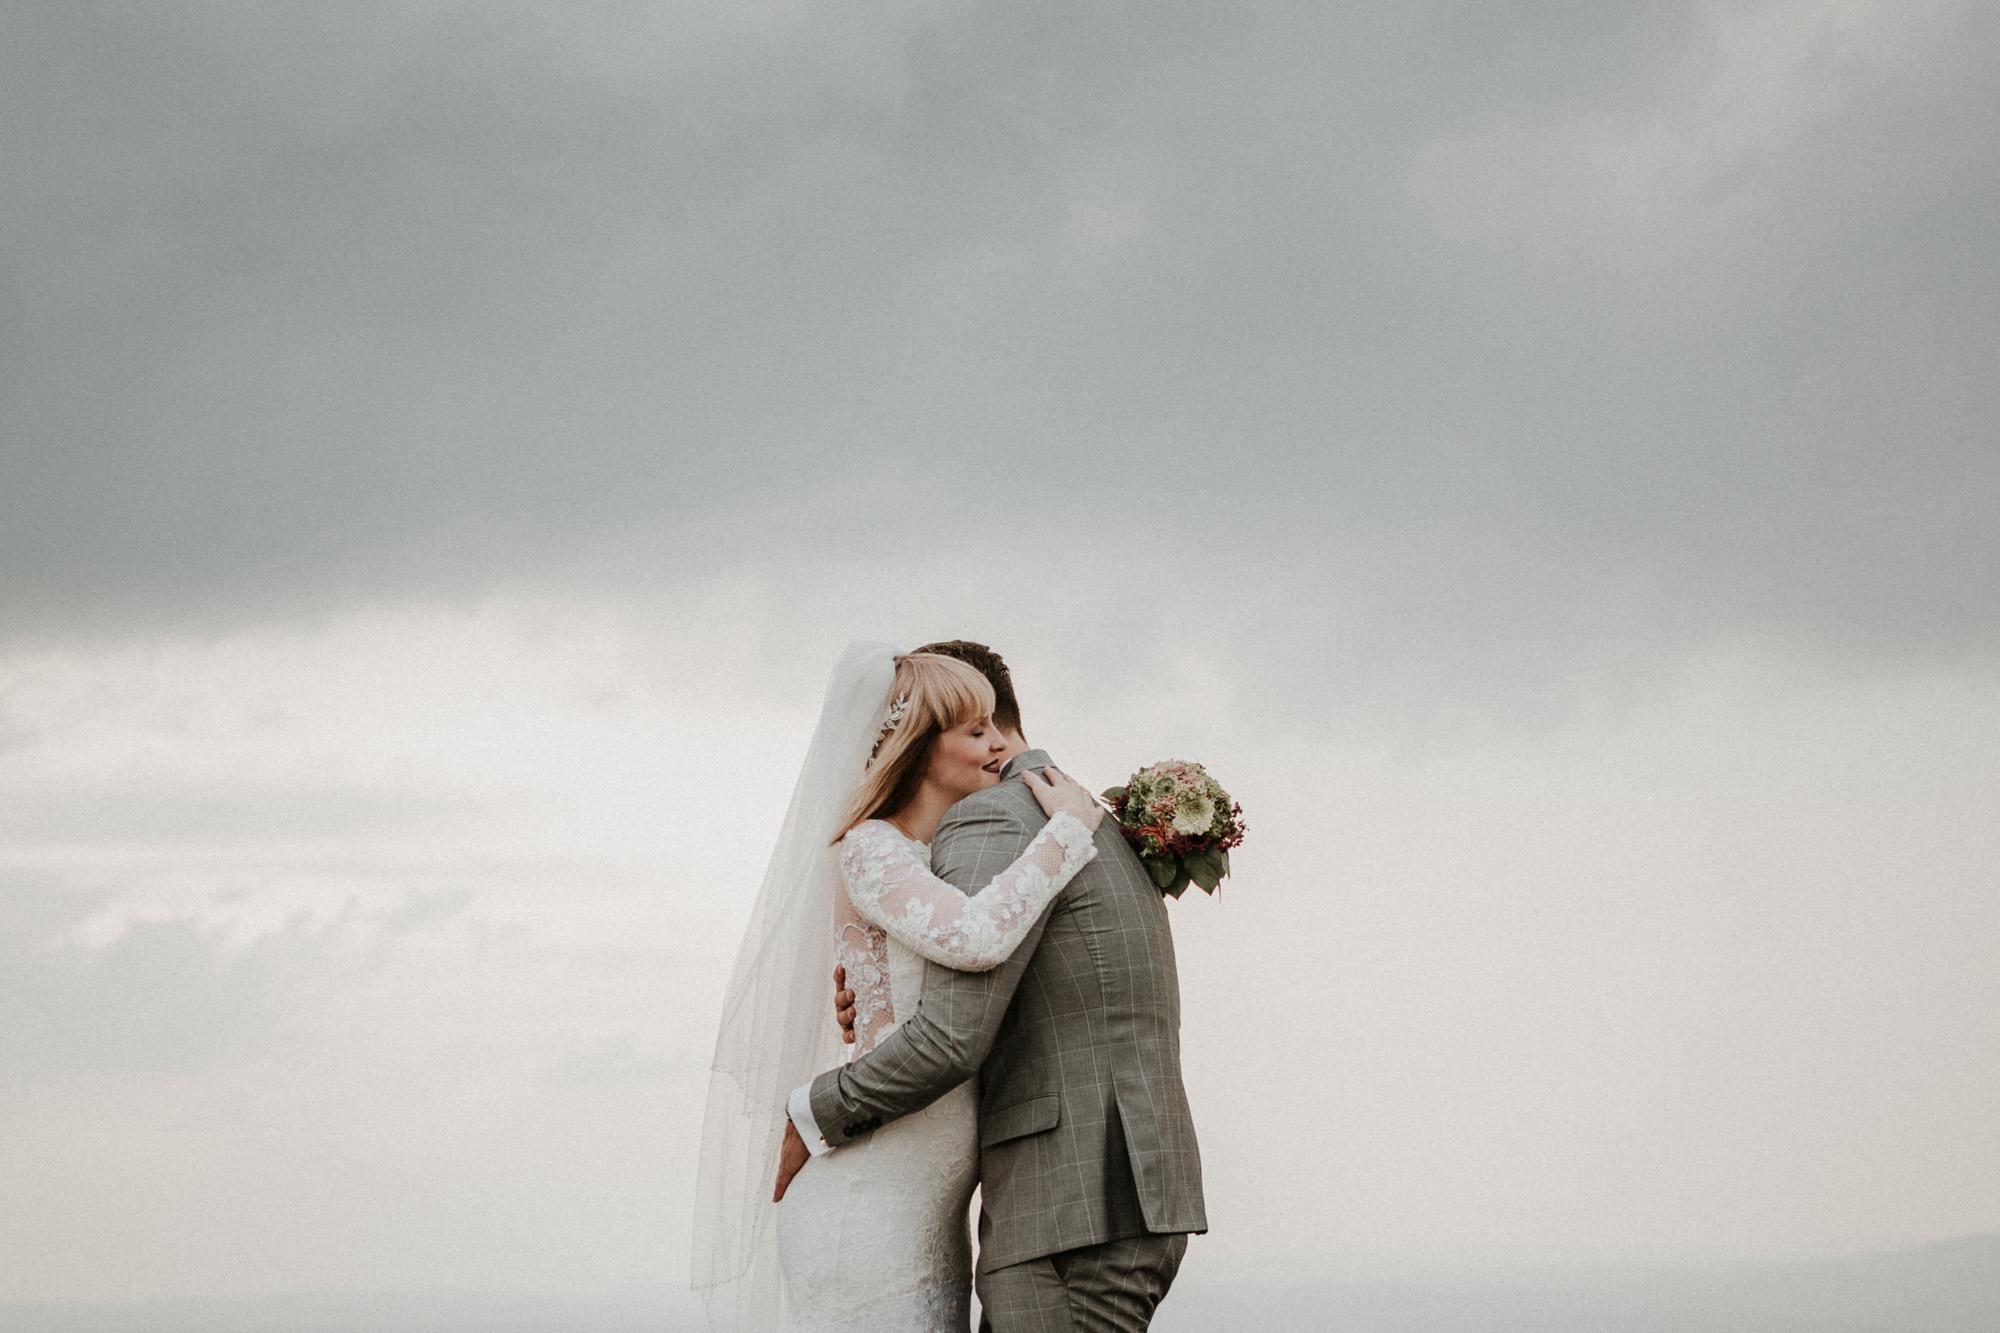 DanielaMarquardtPhotography_Hochzeitsfotograf_Düsseldorf_Köln_Mallorca_Bayern_Austria_Harz_LinaundMaik_Afterwedding-Shooting_Weddingphotographer_Ibiza_Tuskany_Italien_Toskana11